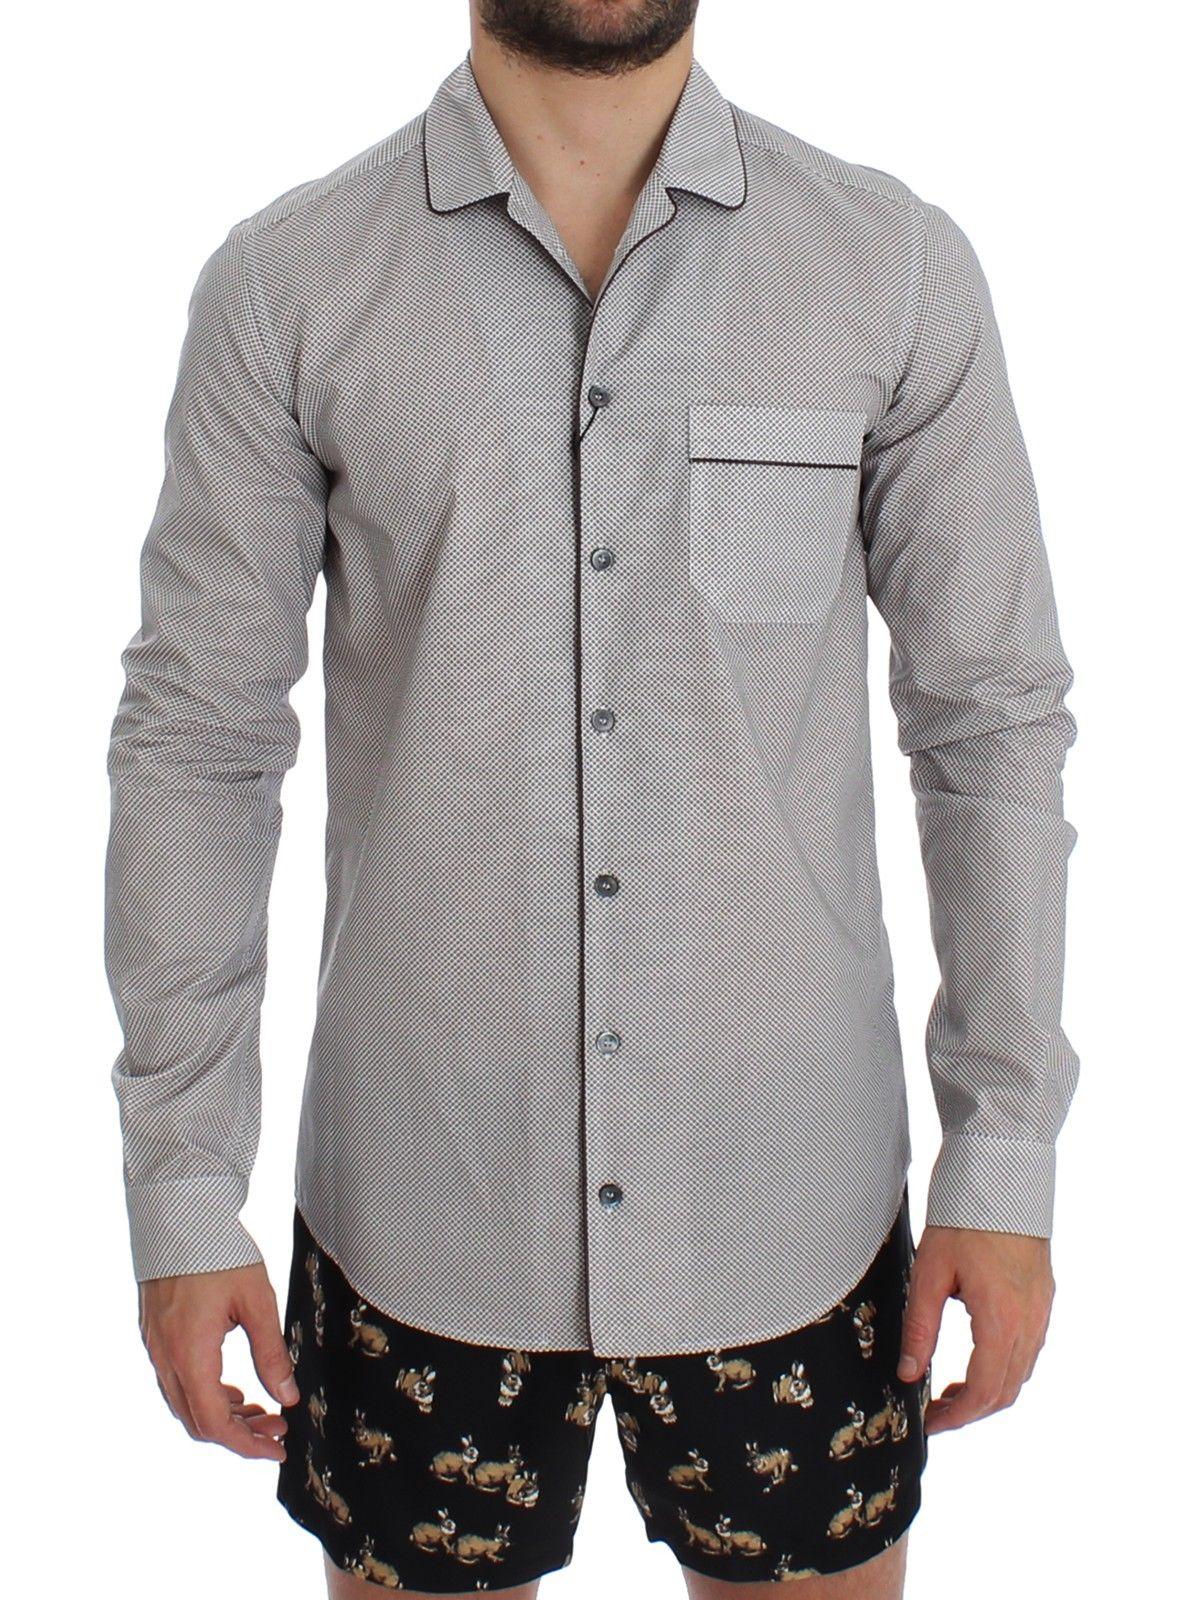 Dolce & Gabbana Men's Cotton Pajama Shirt White SIG12391 - S